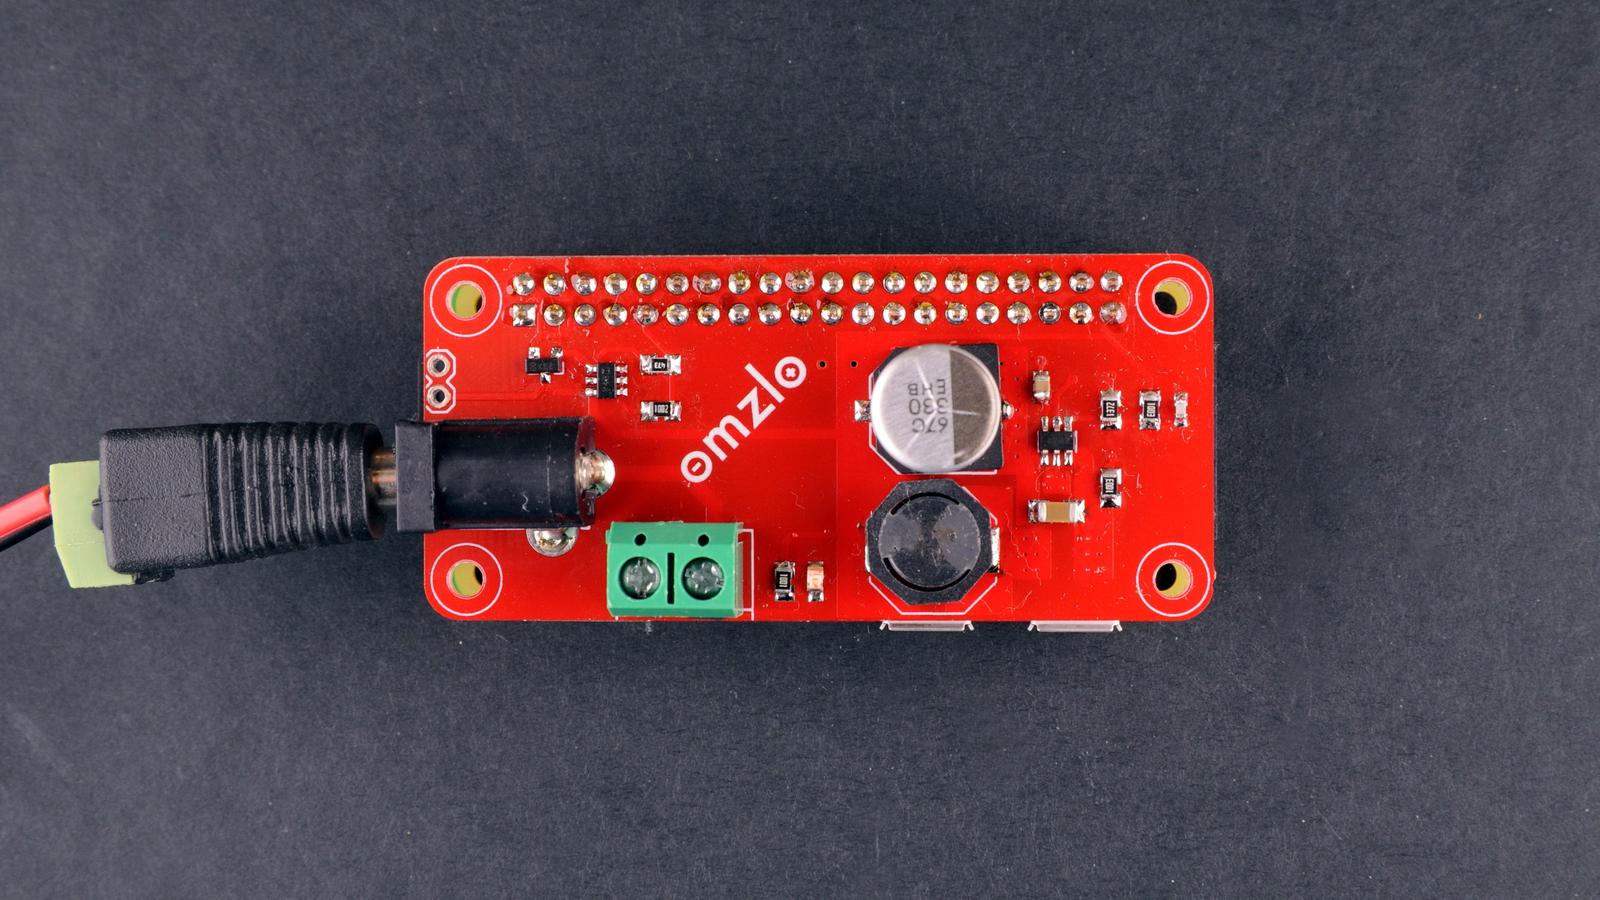 Omzlo Adding A Dc Power Jack To The Raspberry Pi Voltage Regulator 12v 15a For Battery By Mc34063